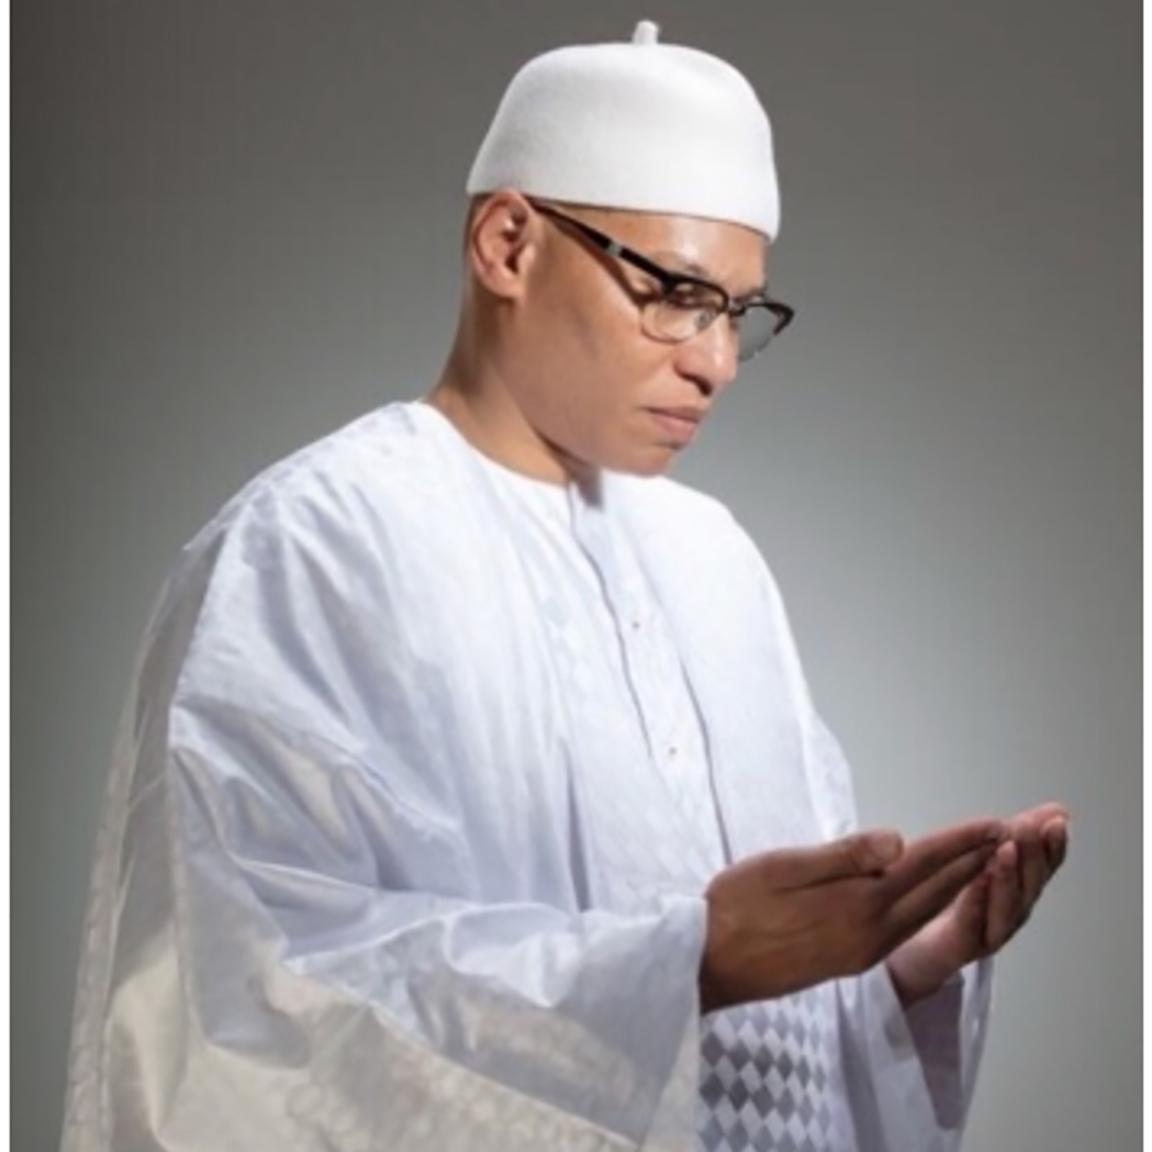 Candidature, Intimidations, Karim Wade, Régime